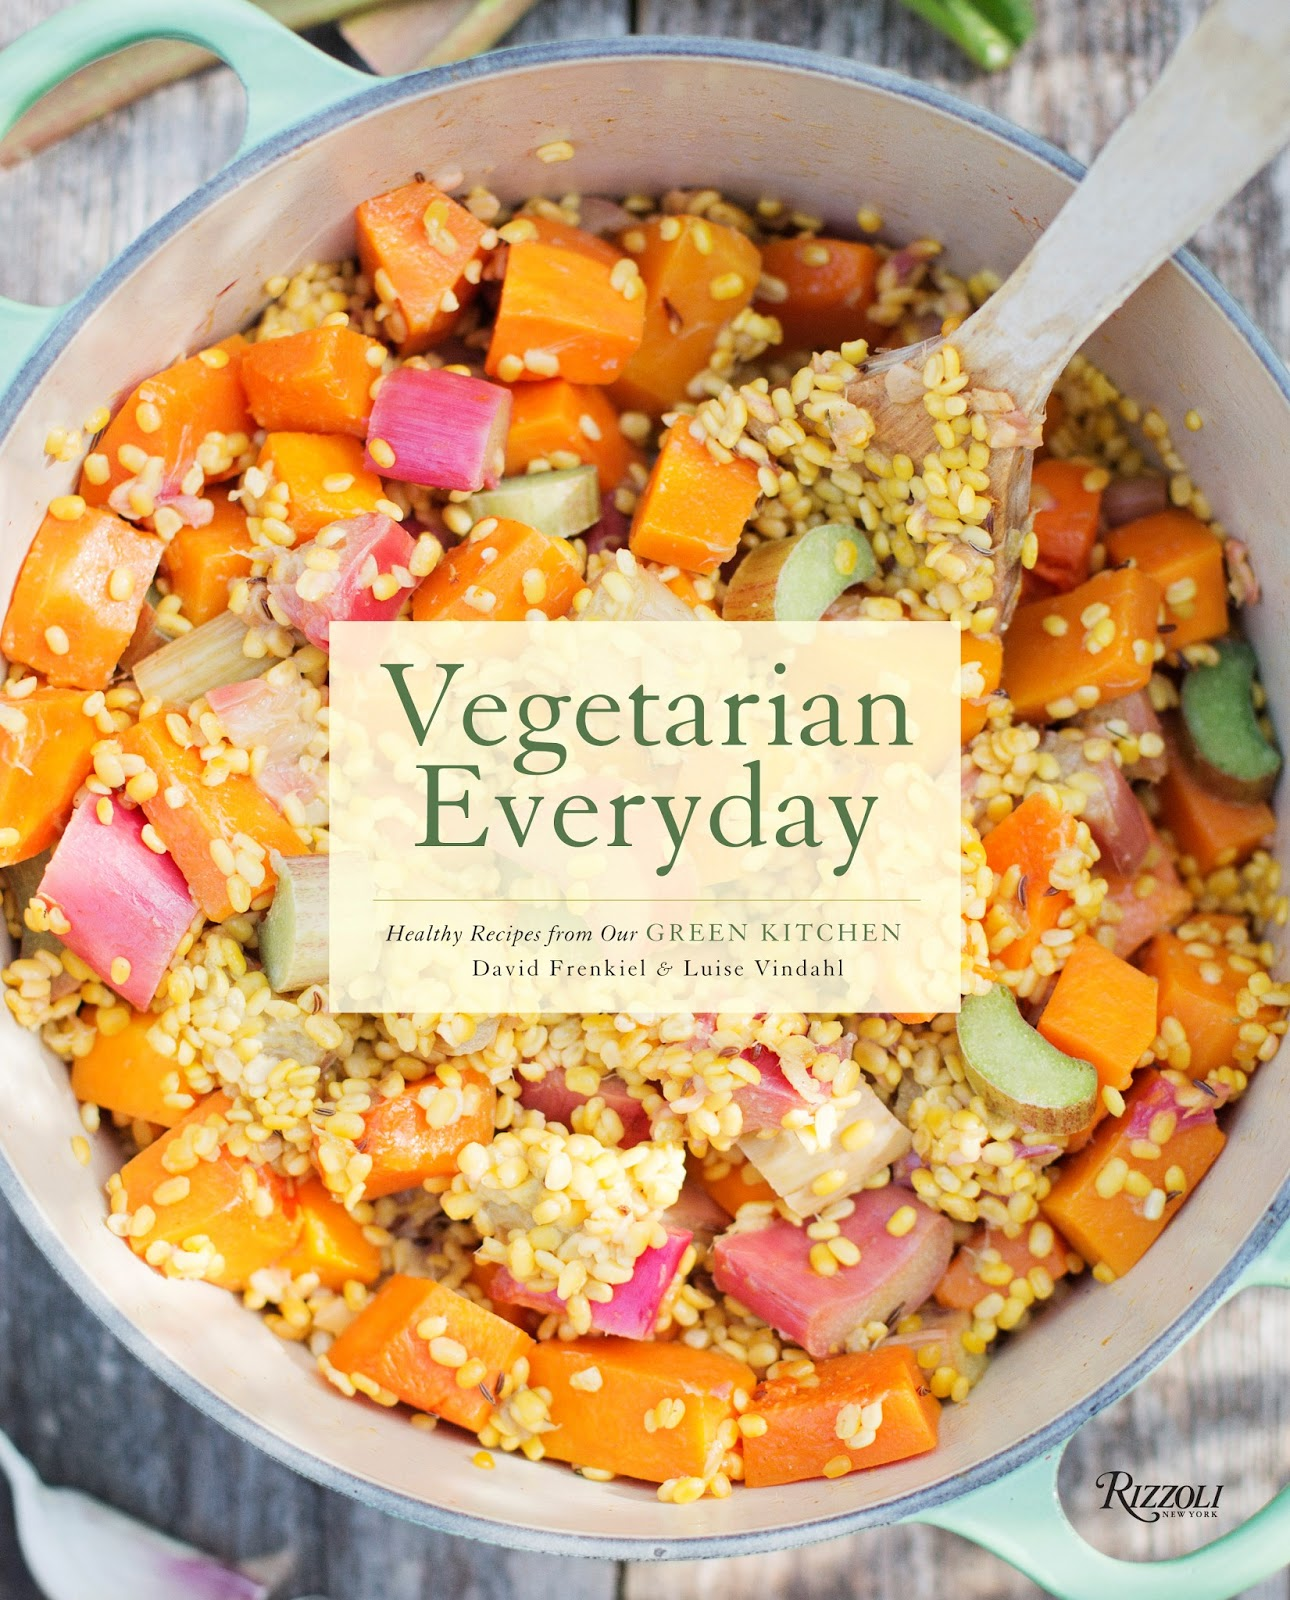 Vegetarian Everyday #cookbook #giveaway